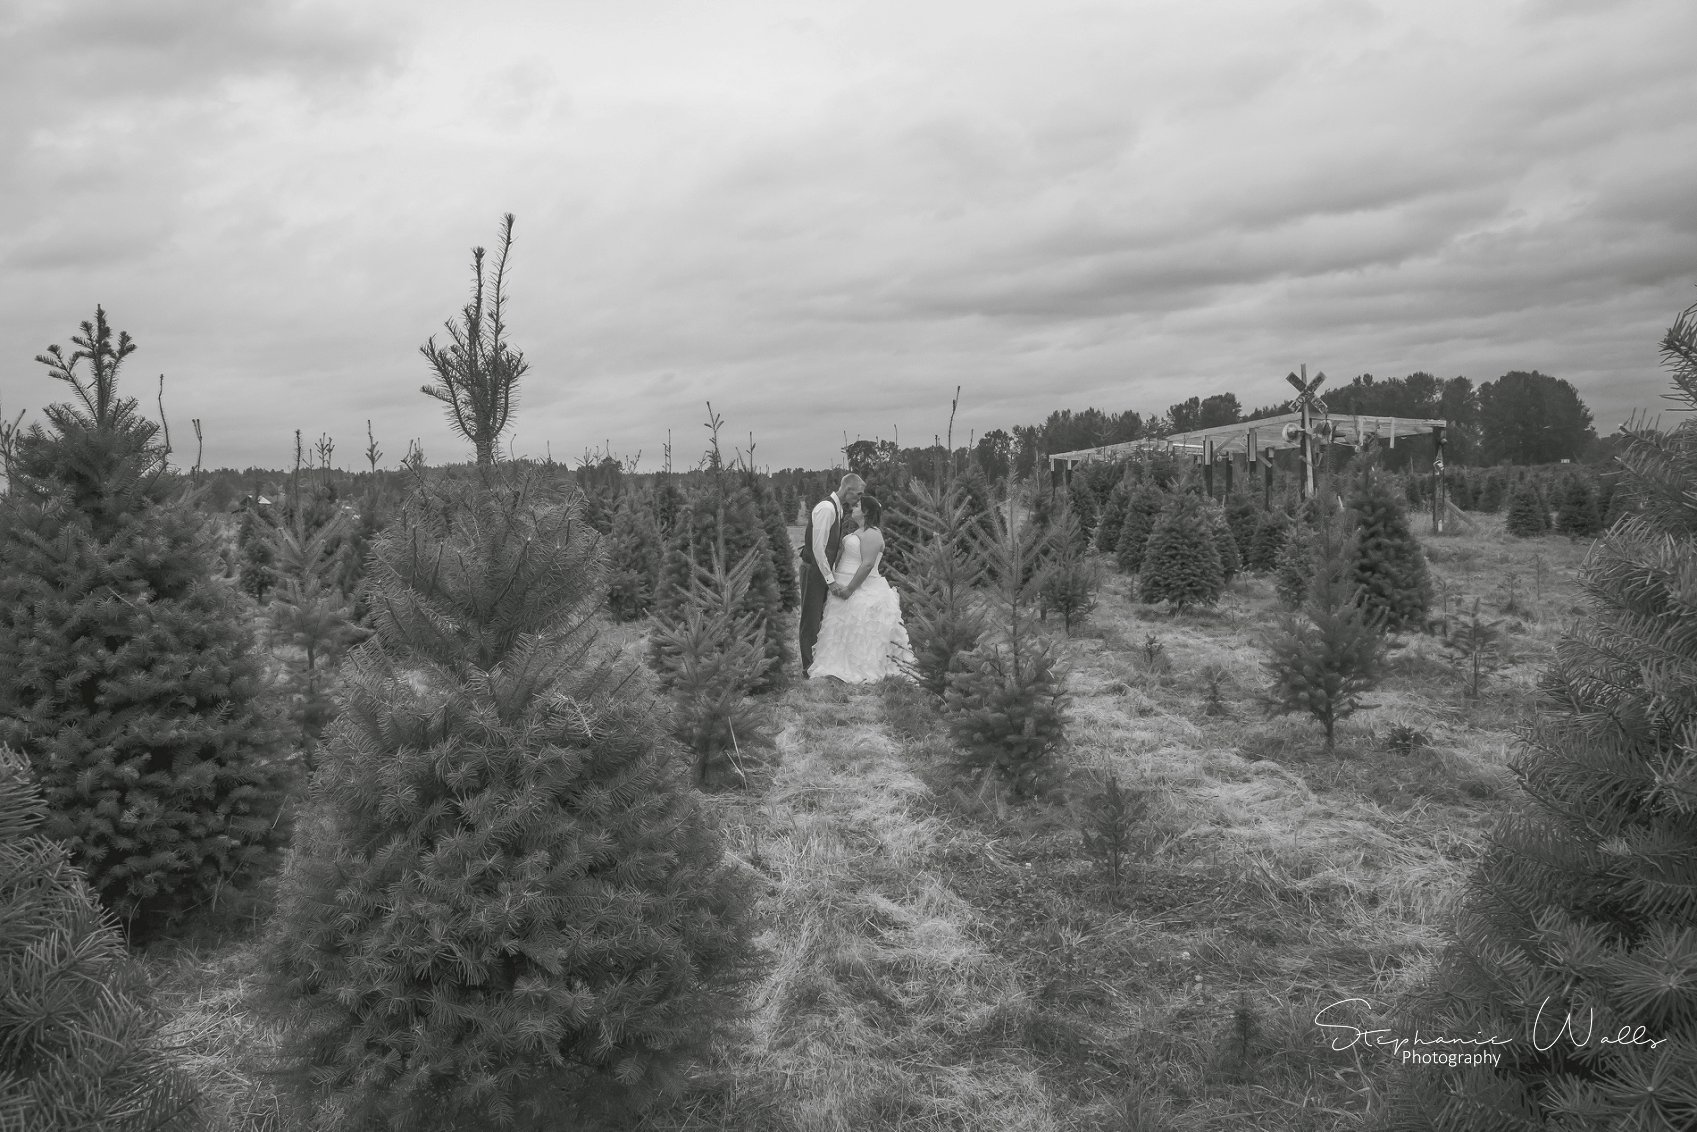 Kimble Wedding 102 1 Marlena & Allans | Snohomish Red Barn Events (Stocker Farms) | Snohomish, Wa Wedding Photographer